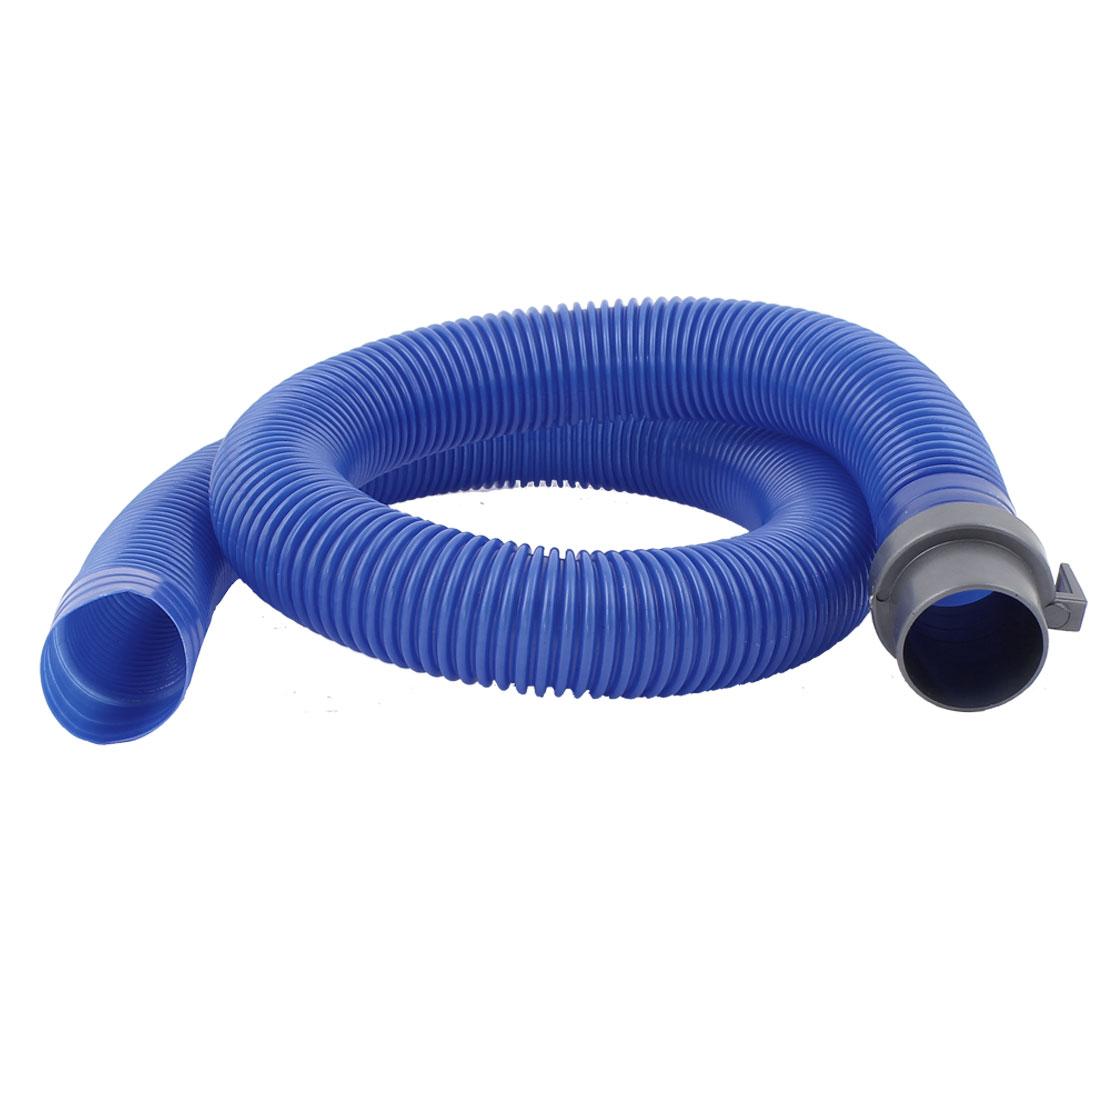 Washer Washing Machine Flexible Outlet Drain Hose Pipe 90cm Long Blue